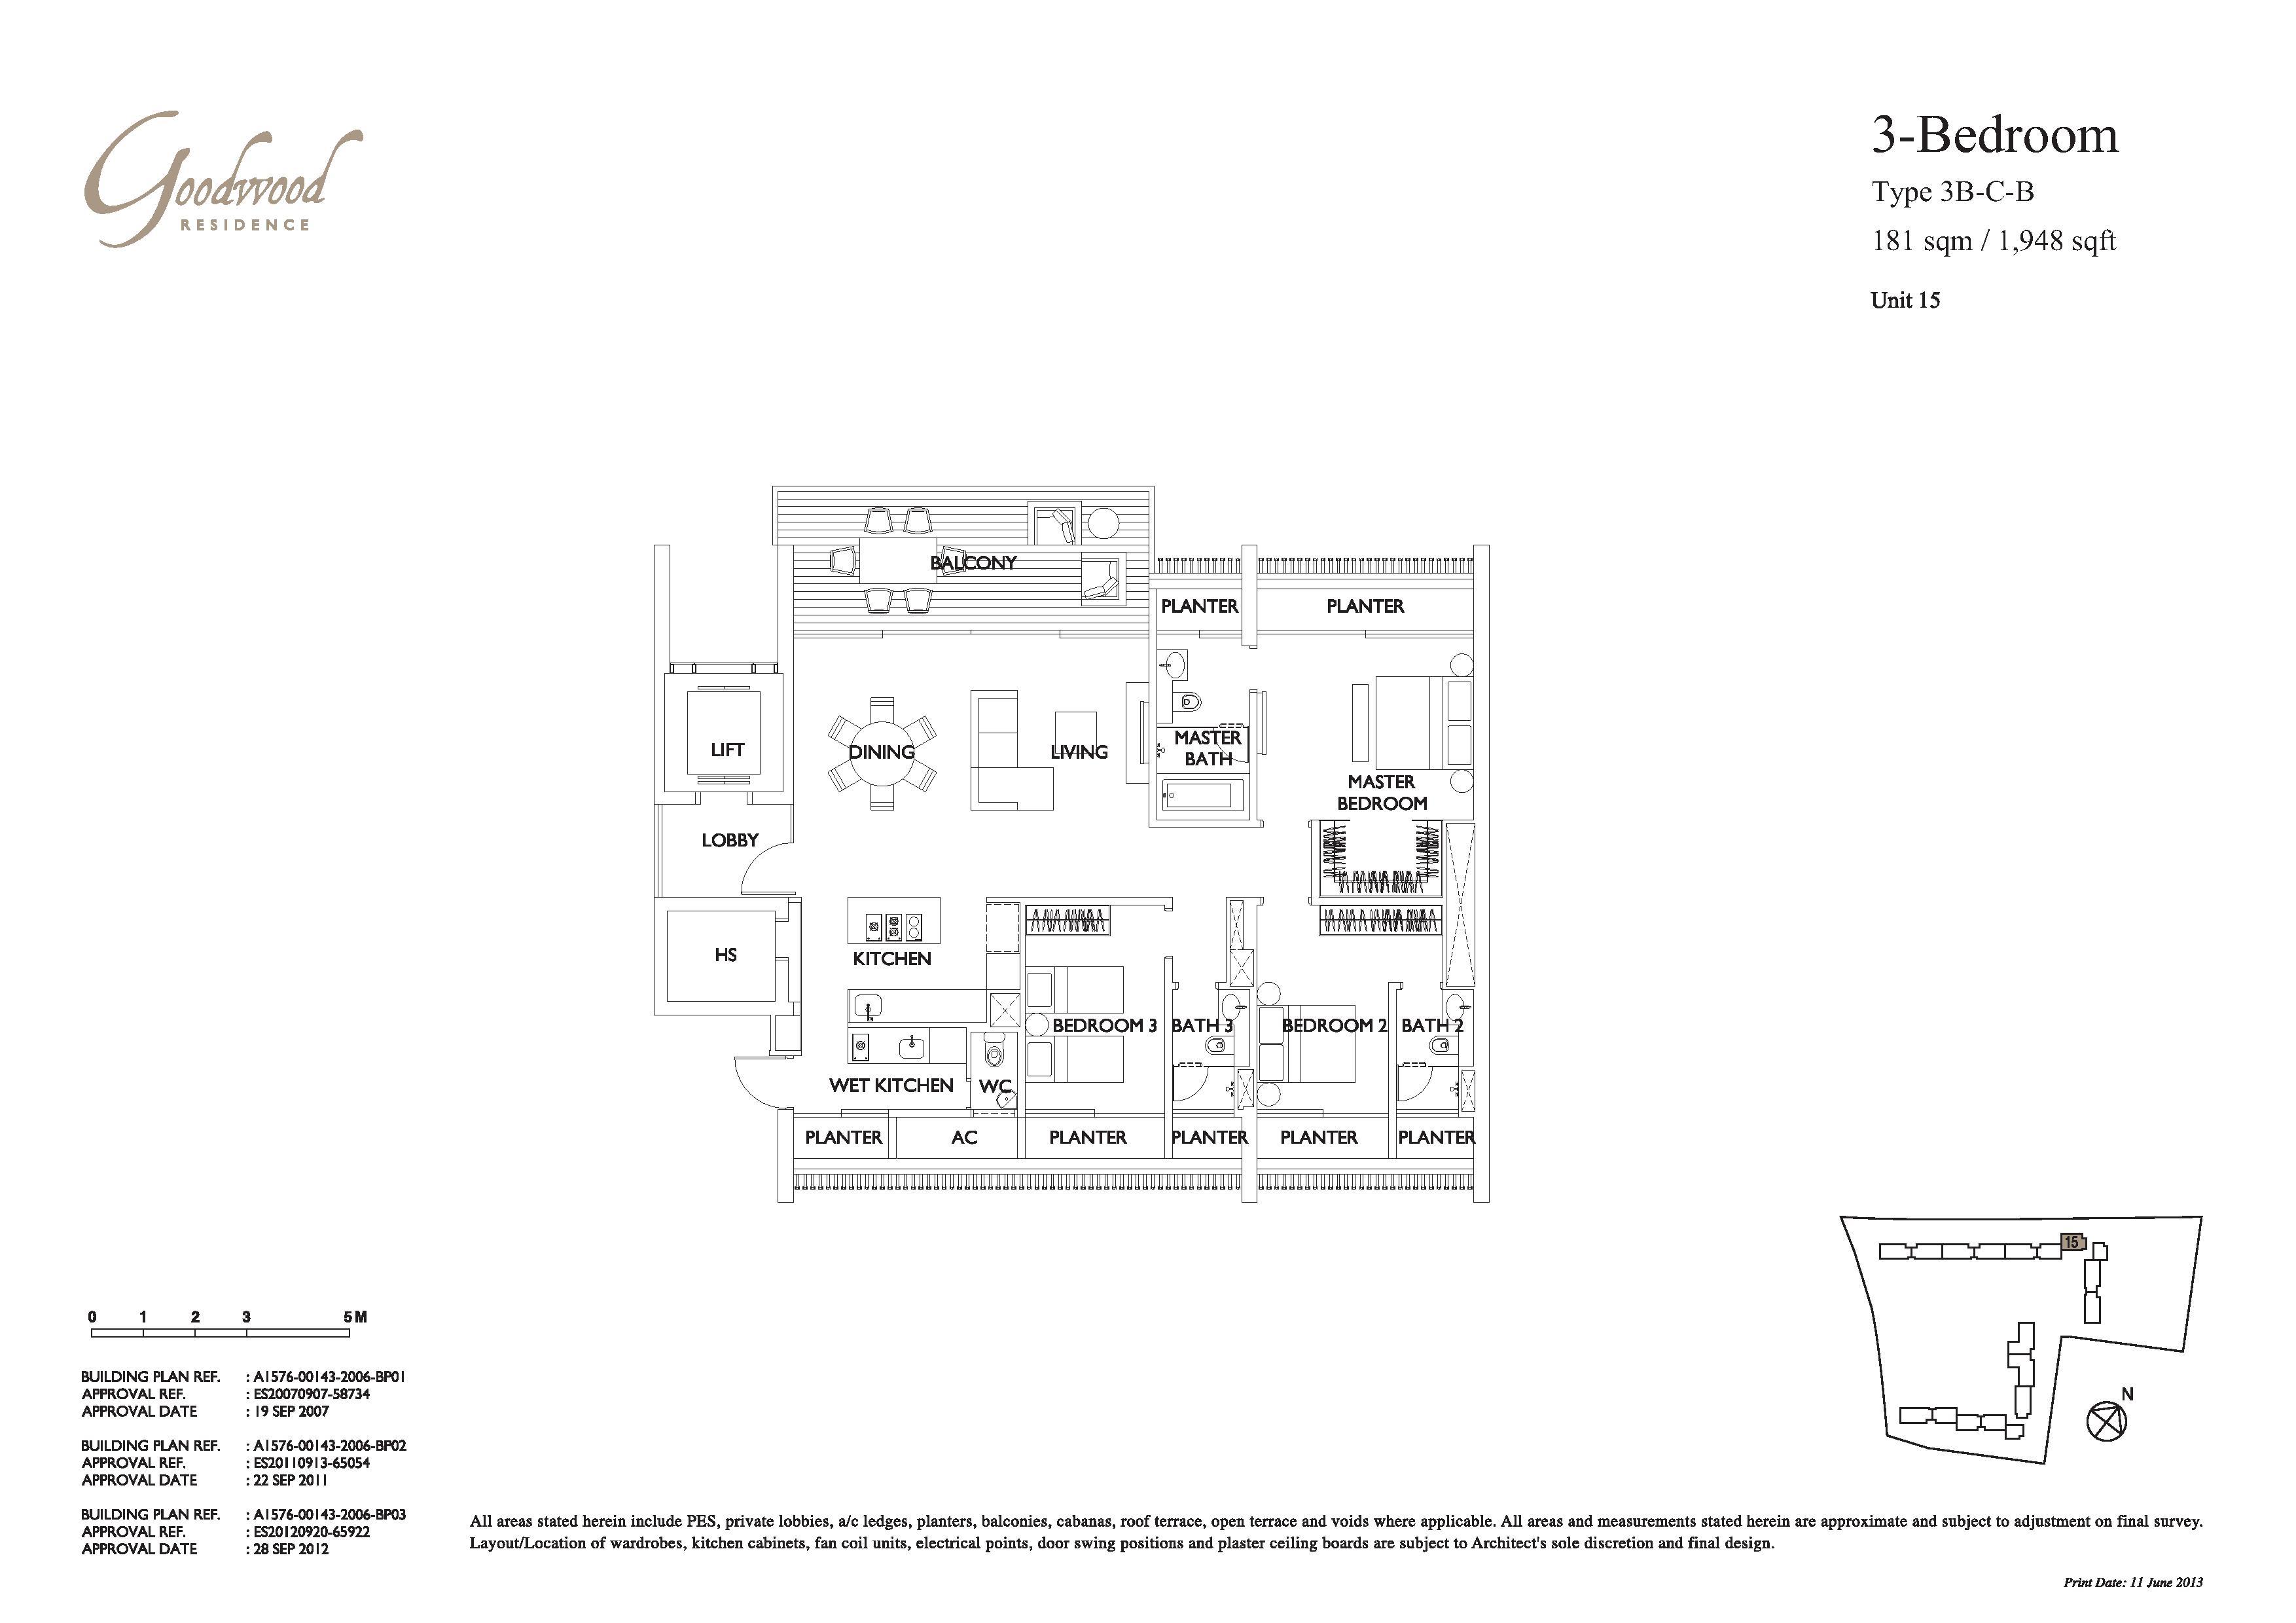 Goodwood Residence Type 3B-C-B Floor Plans